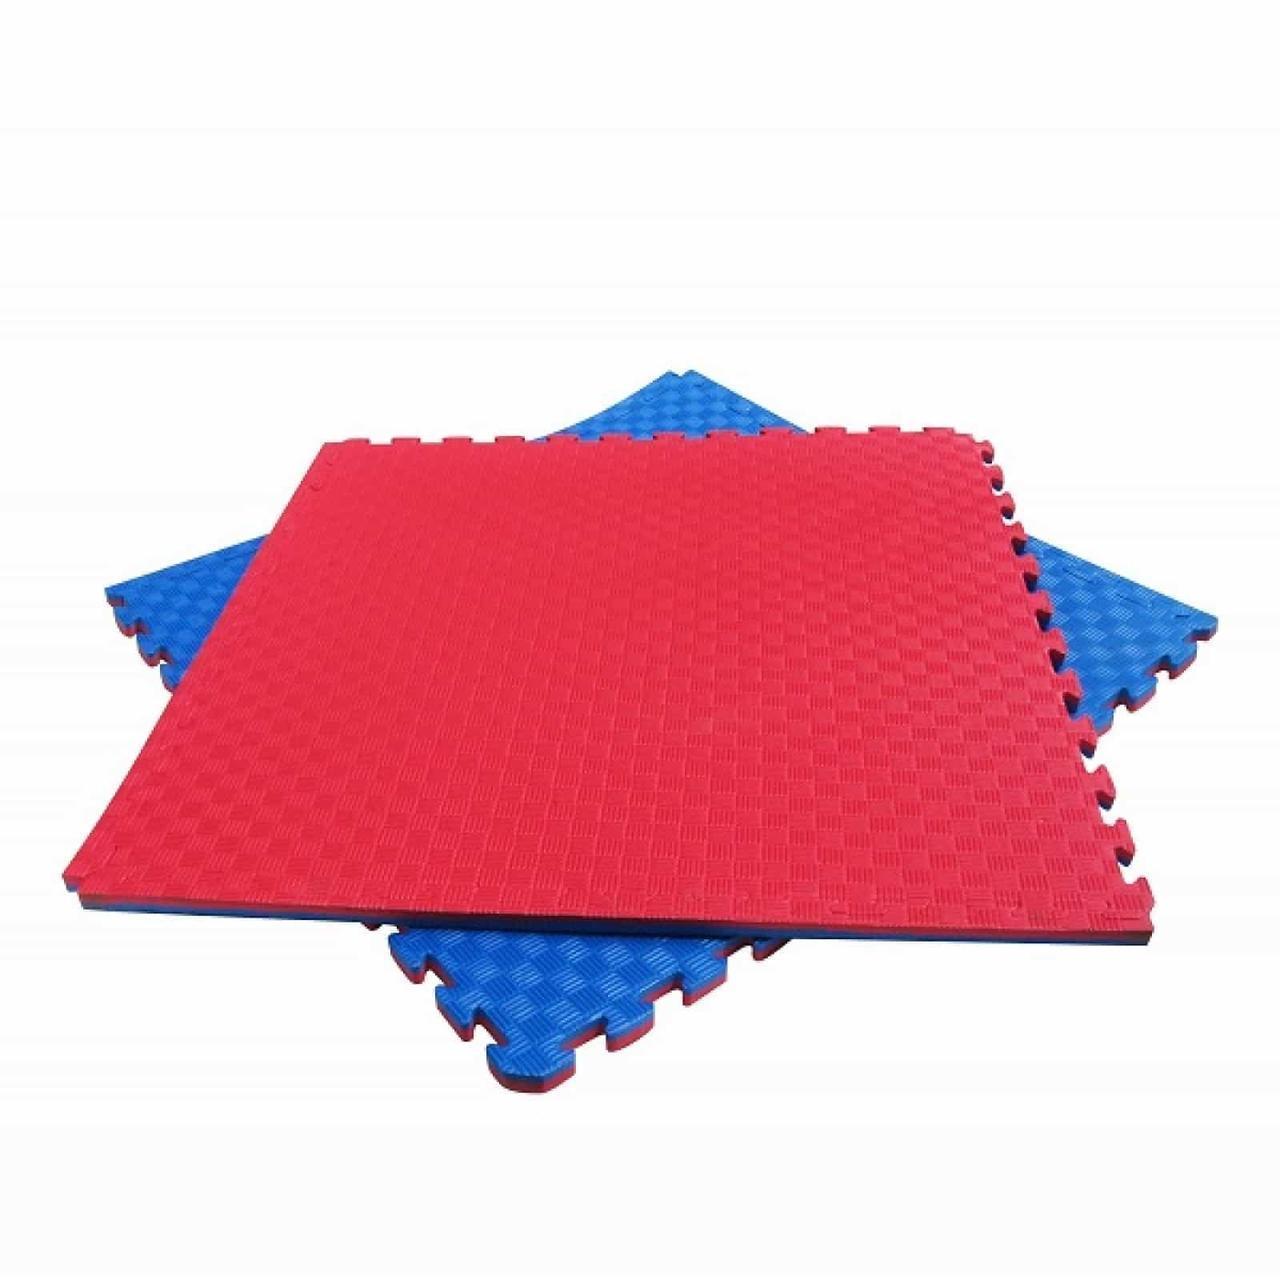 Татами (будо-мат, Даянг) 26мм красный синий